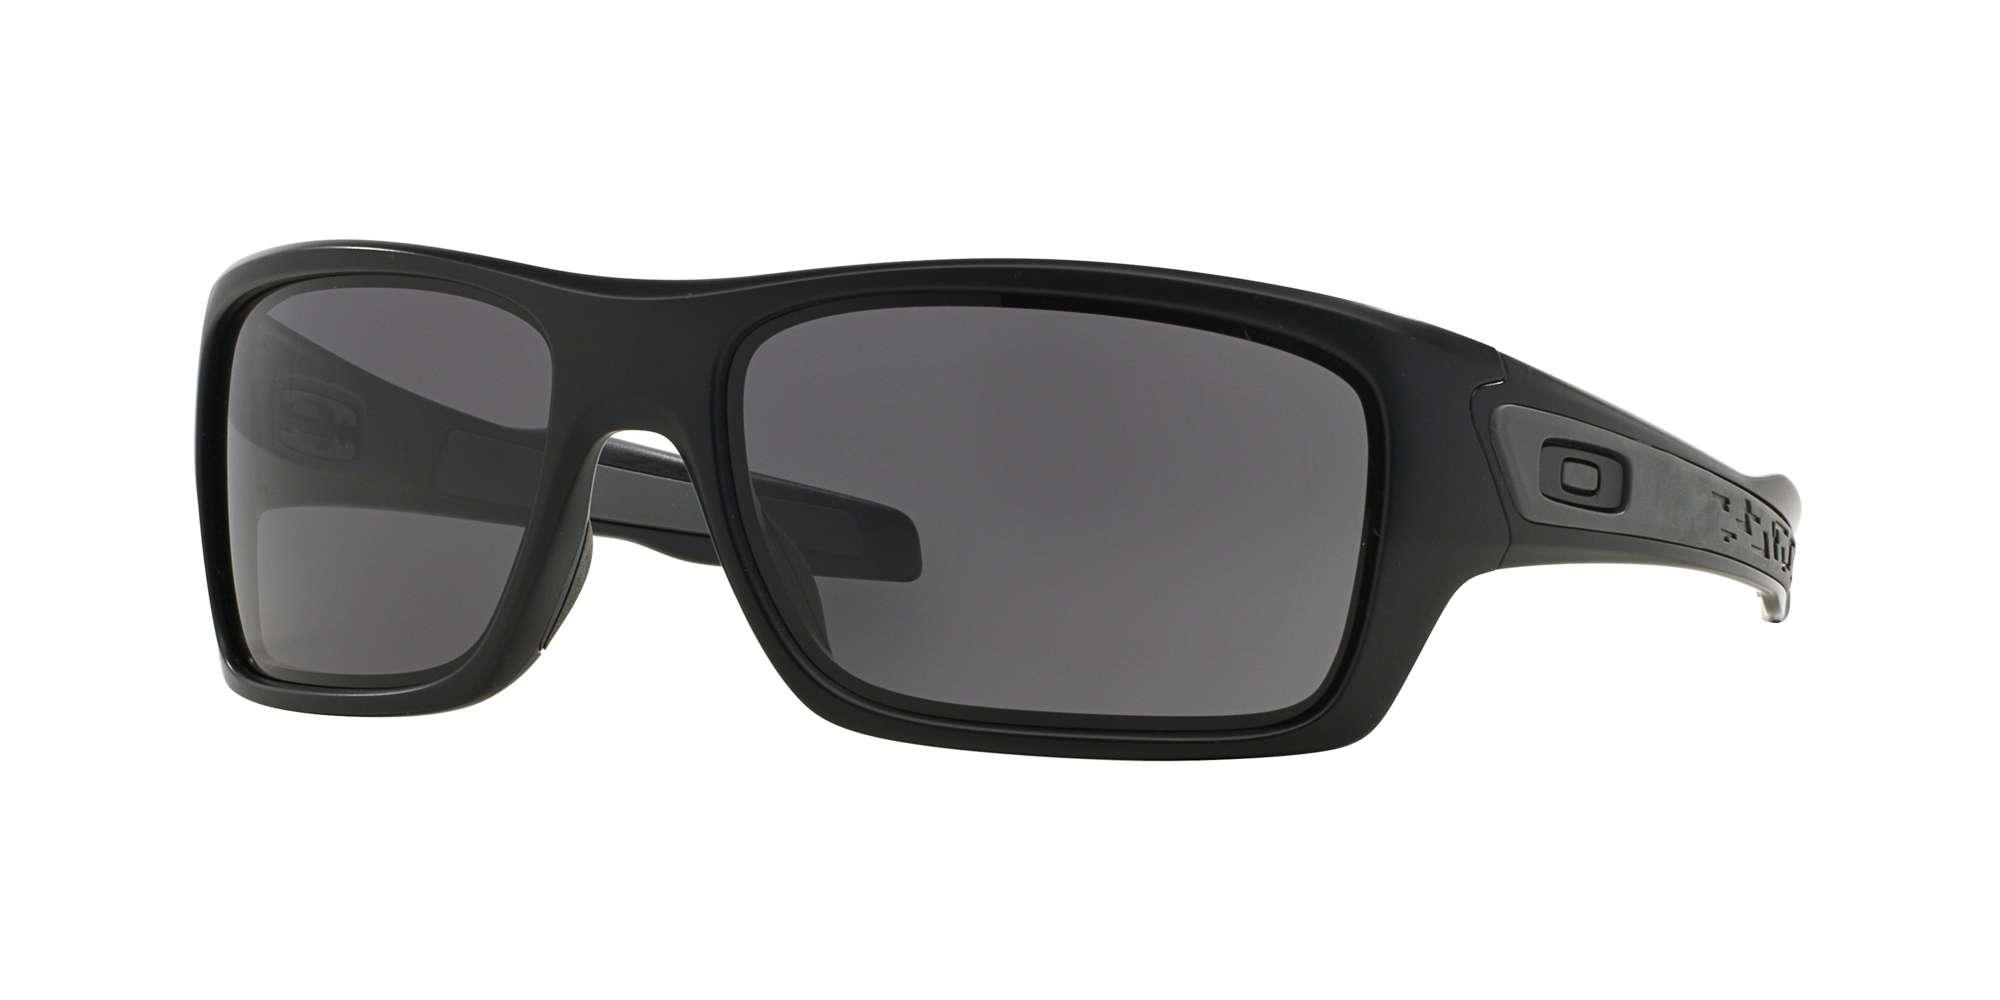 MATTE BLACK / WARM GREY lenses